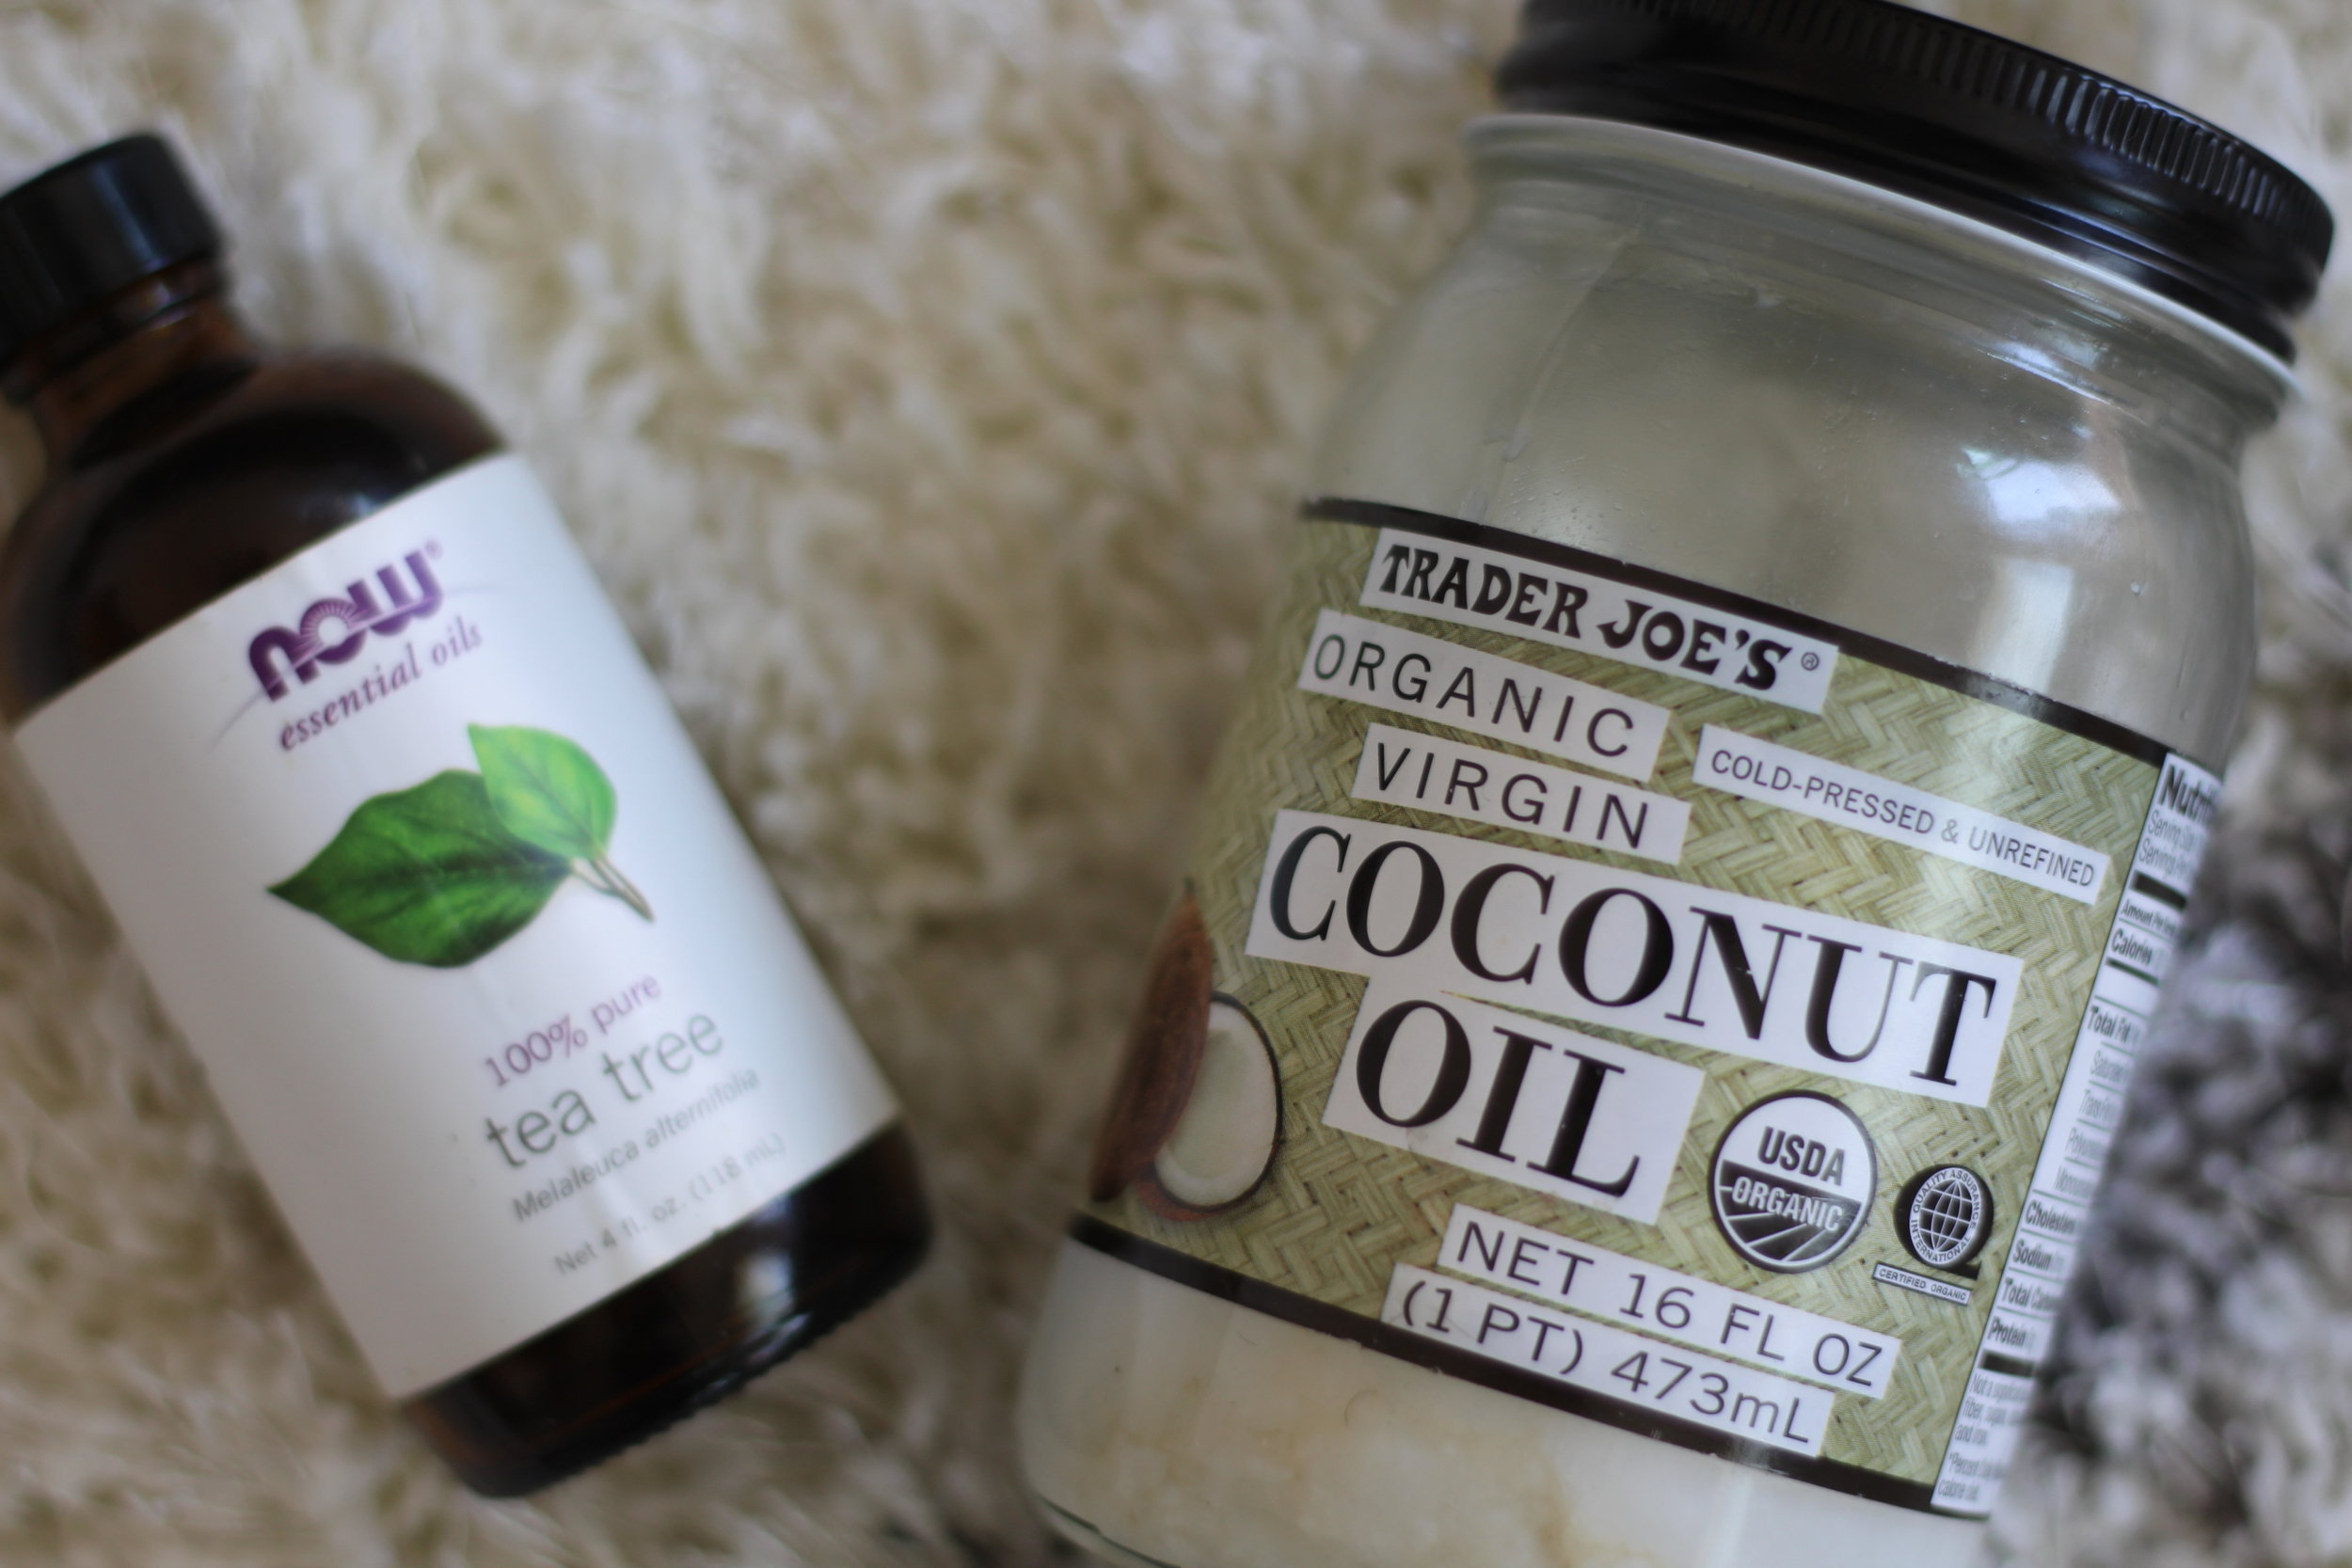 100% Pure Tea Tree Oil, Trader Joe's Organic Coconut Oil